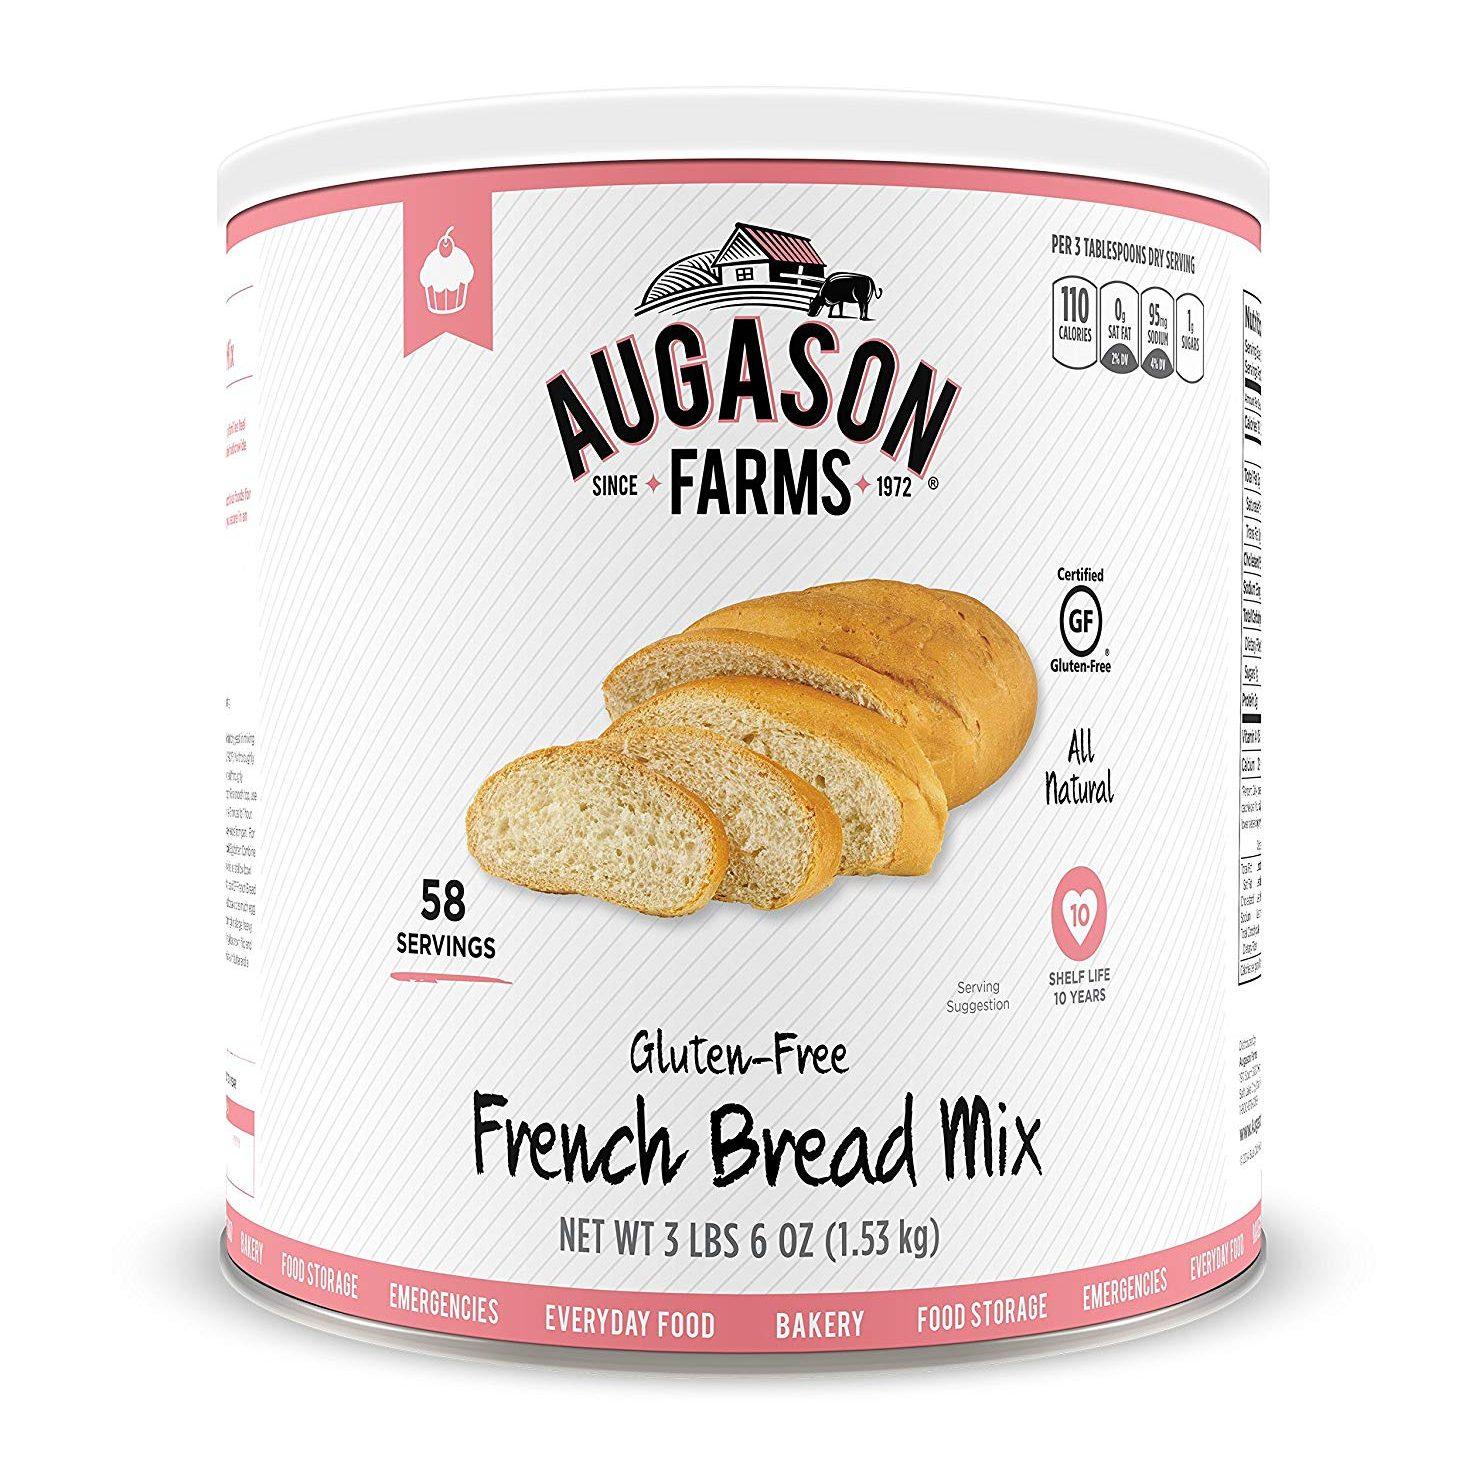 Gluten Free French Bread Mix